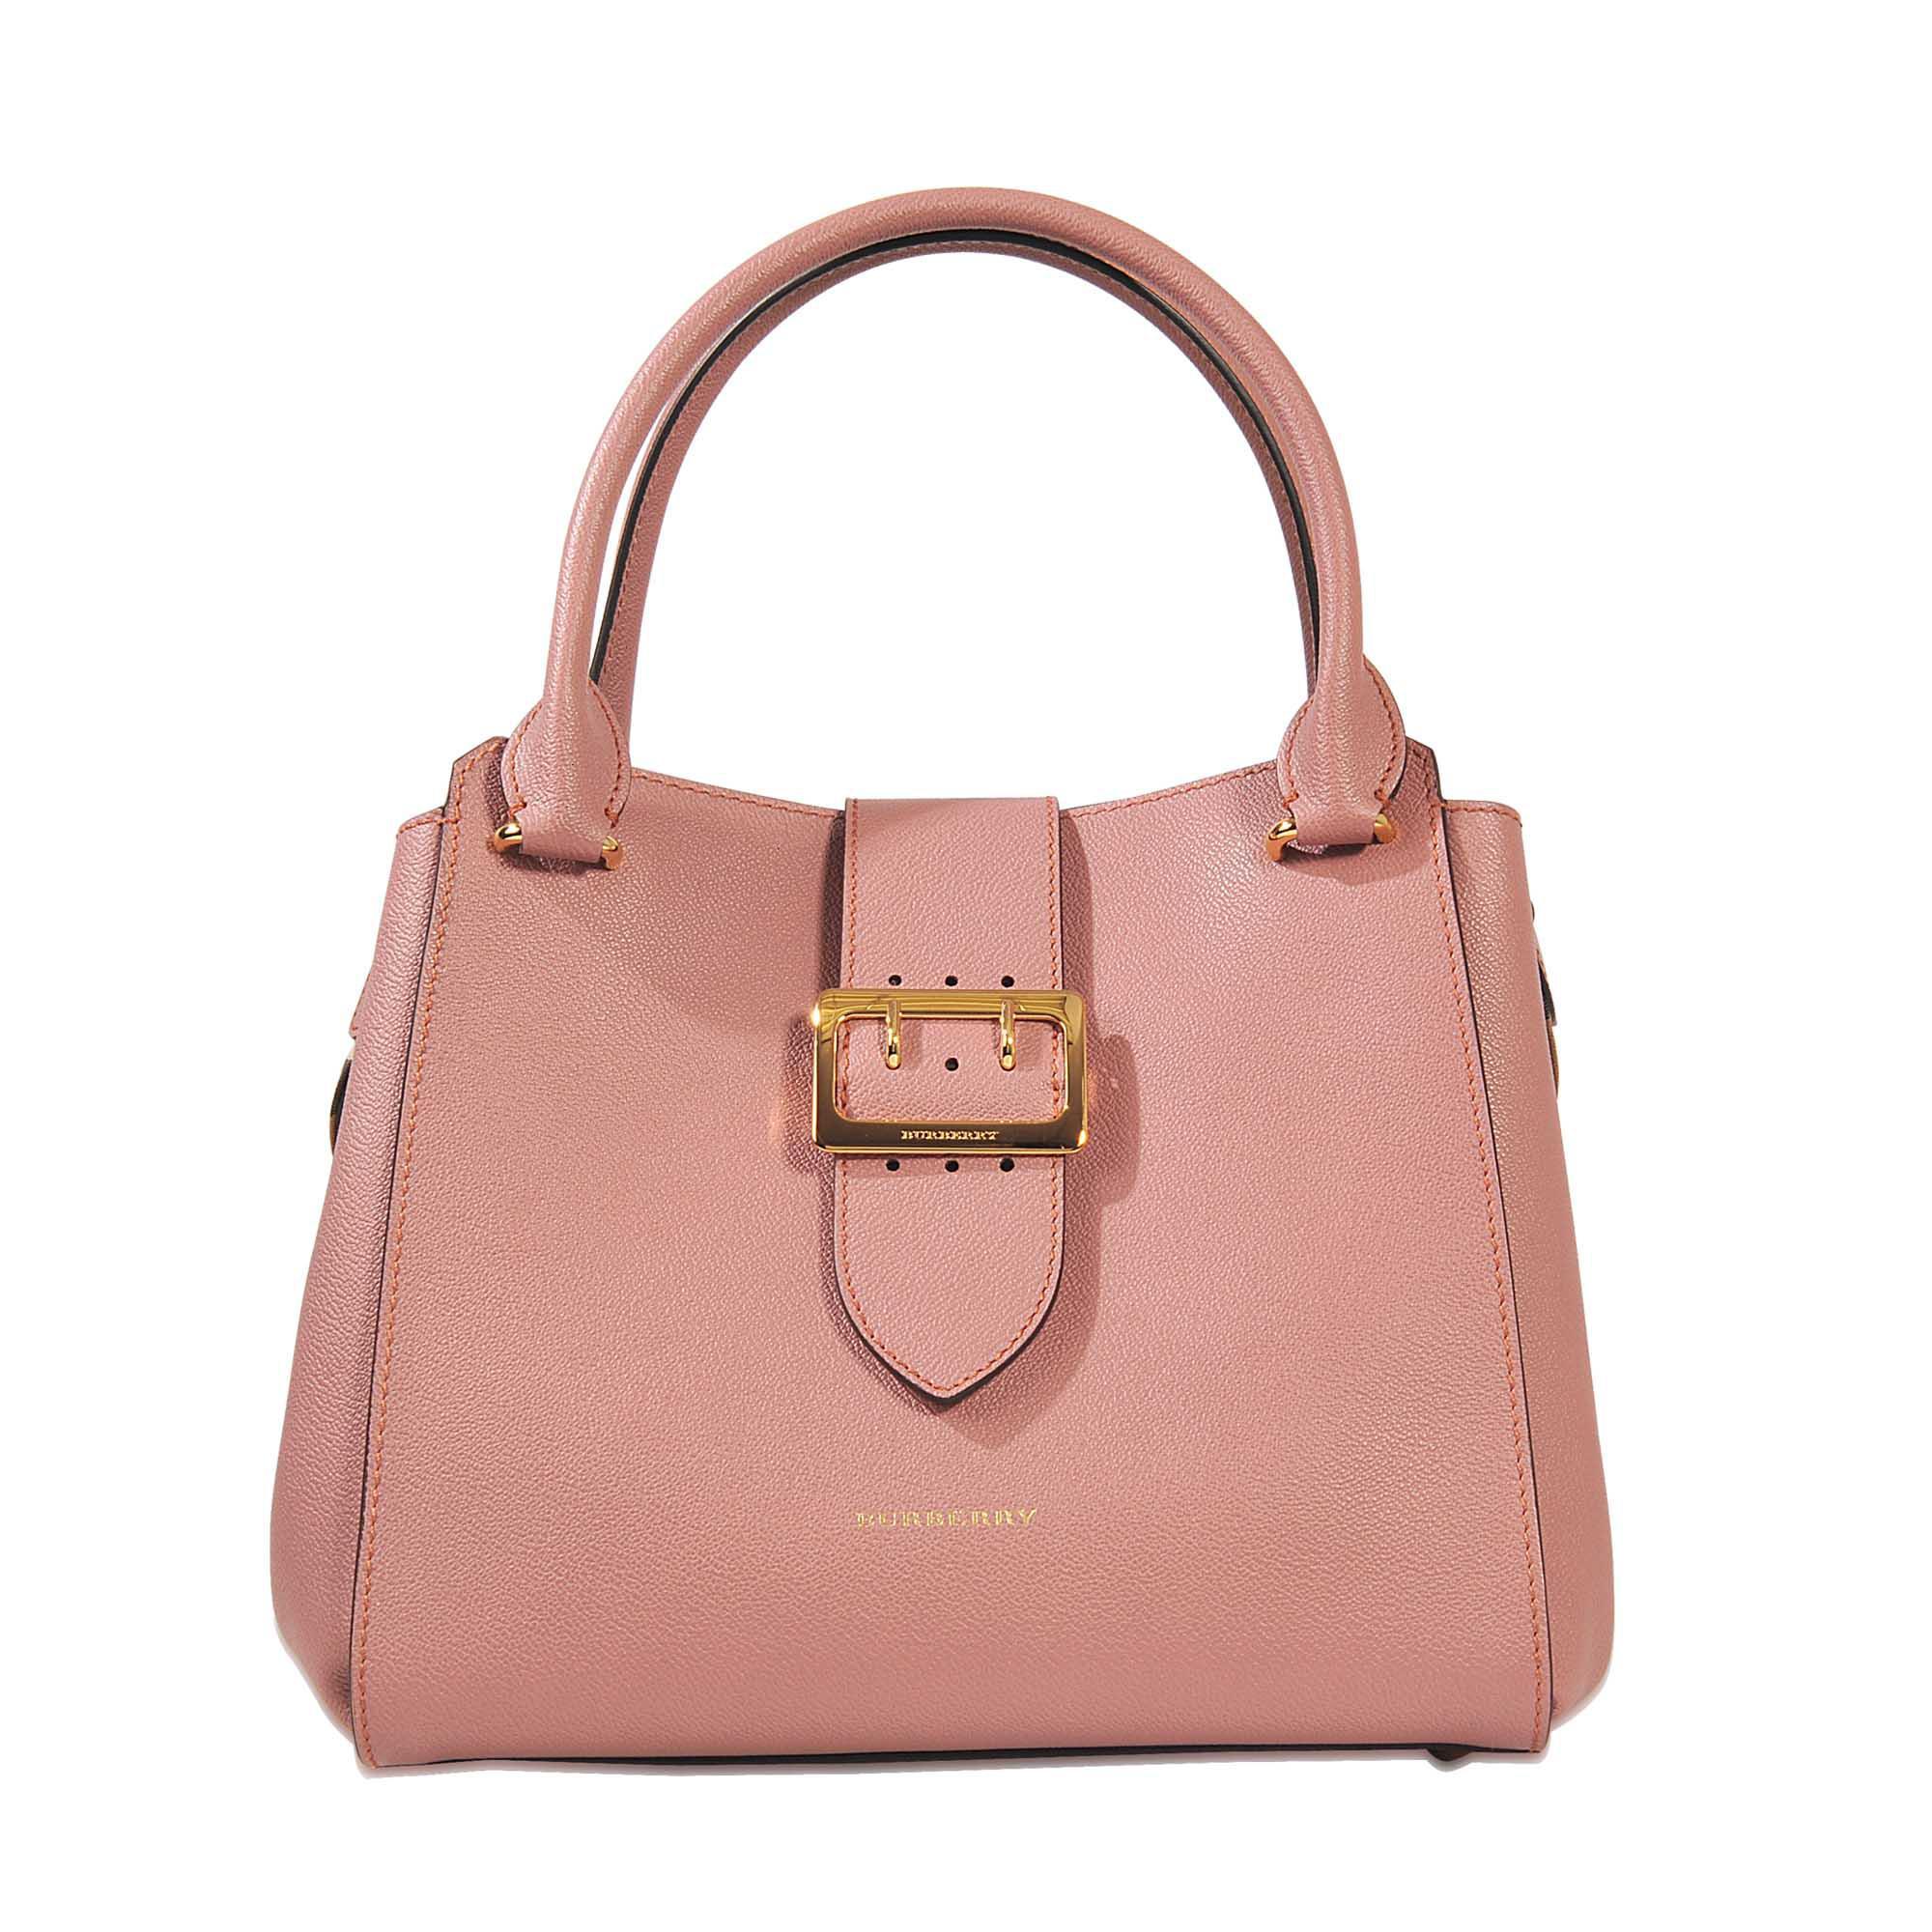 Medium Buckle Tote Bag in Dusty Pink Grained Calfskin Burberry UtUQHUMx